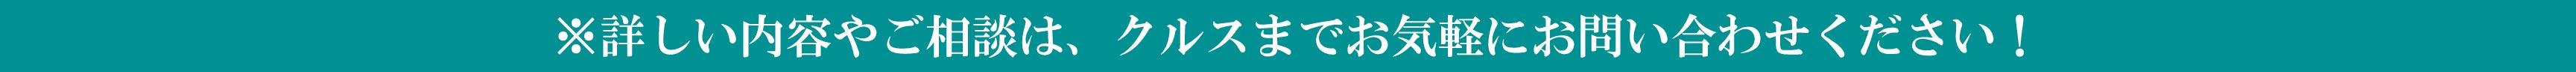 KuraSi-natu-sin73-16.jpg